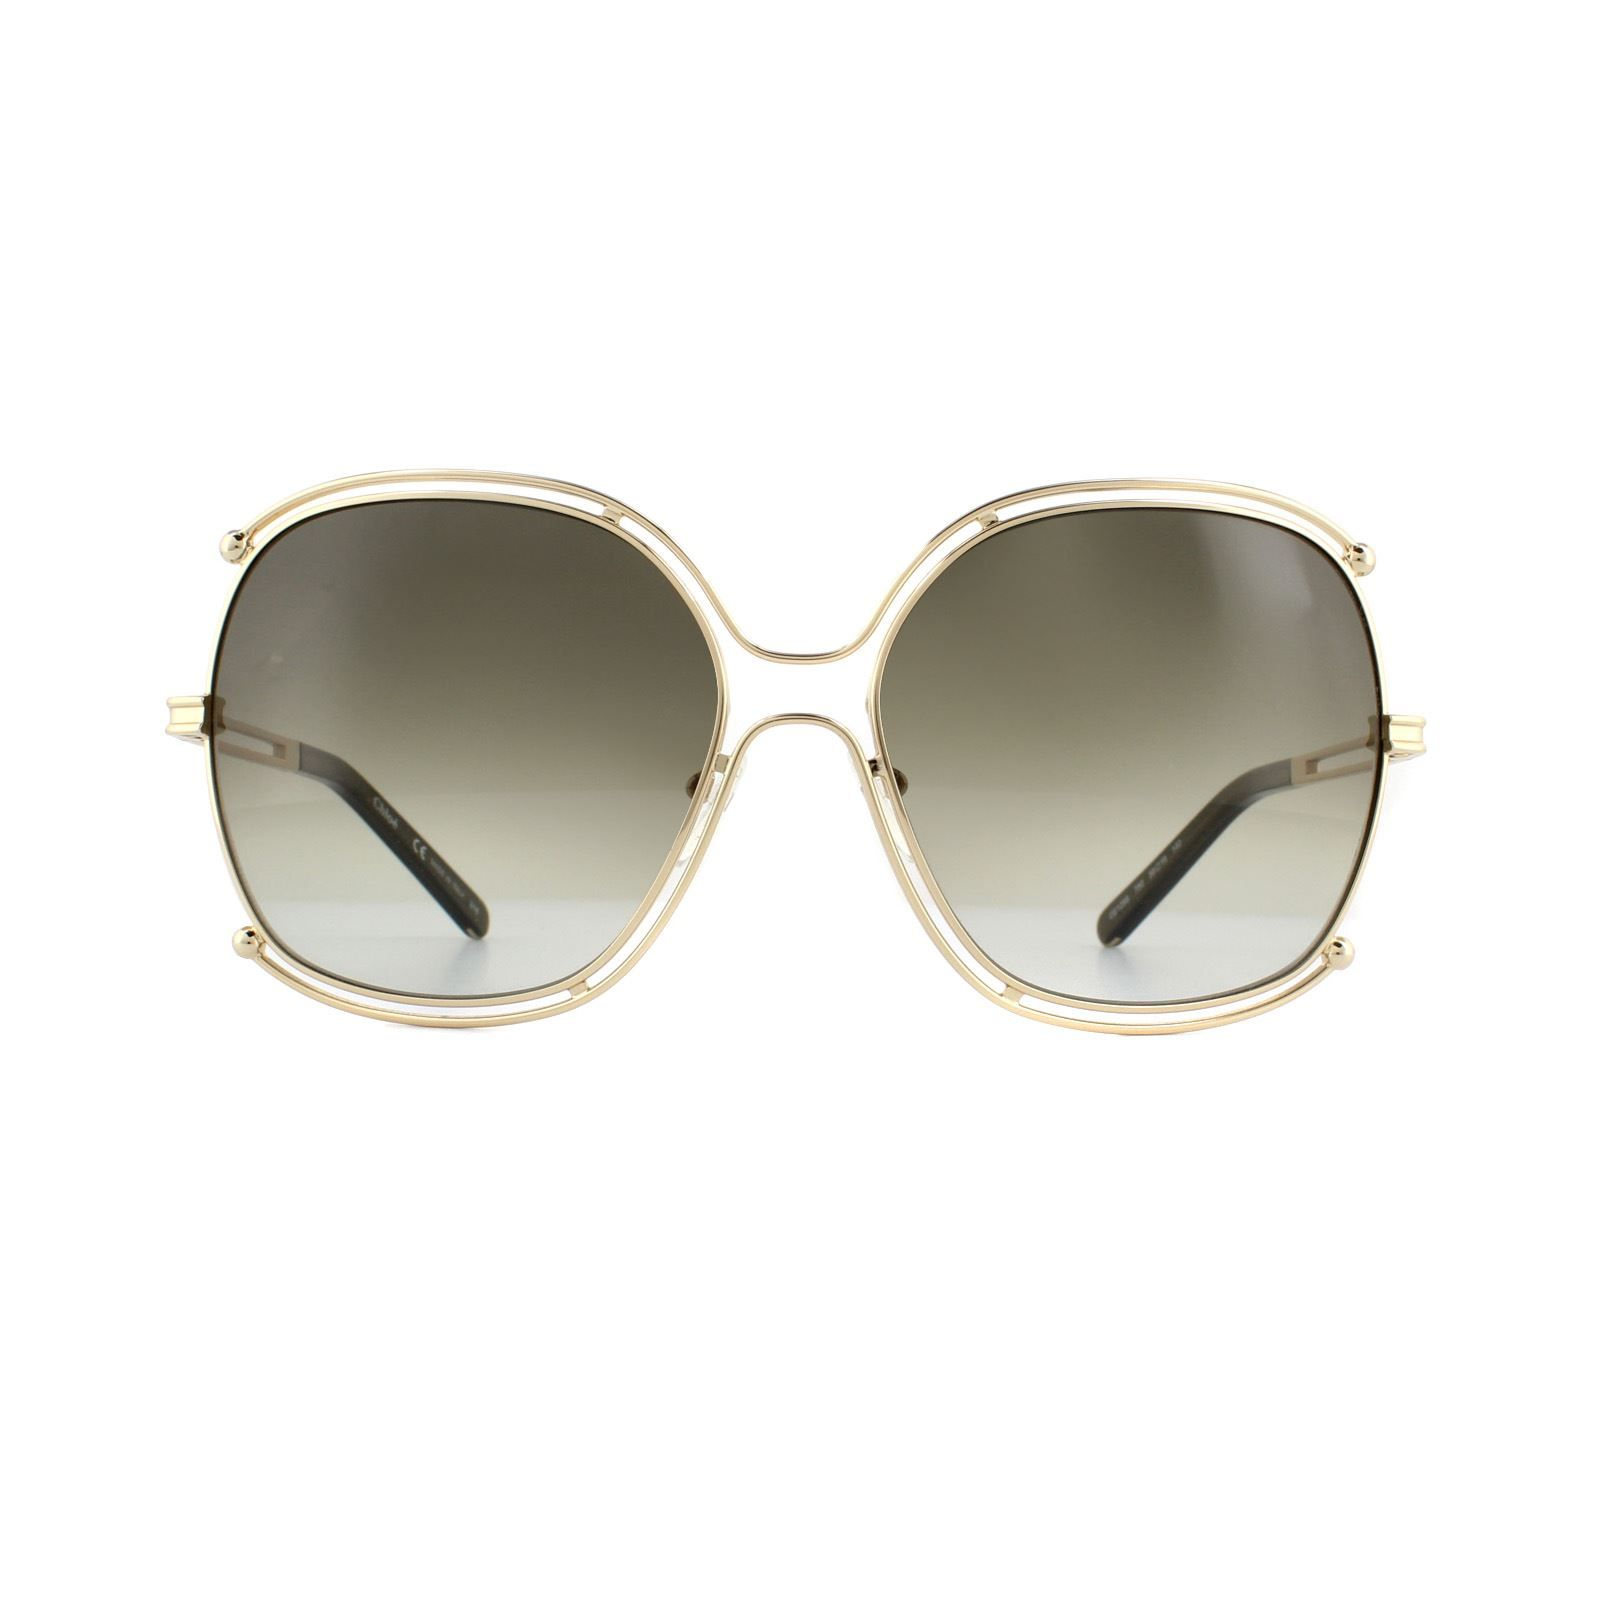 Chloe Sunglasses CE129S 750 Gold Khaki Gradient